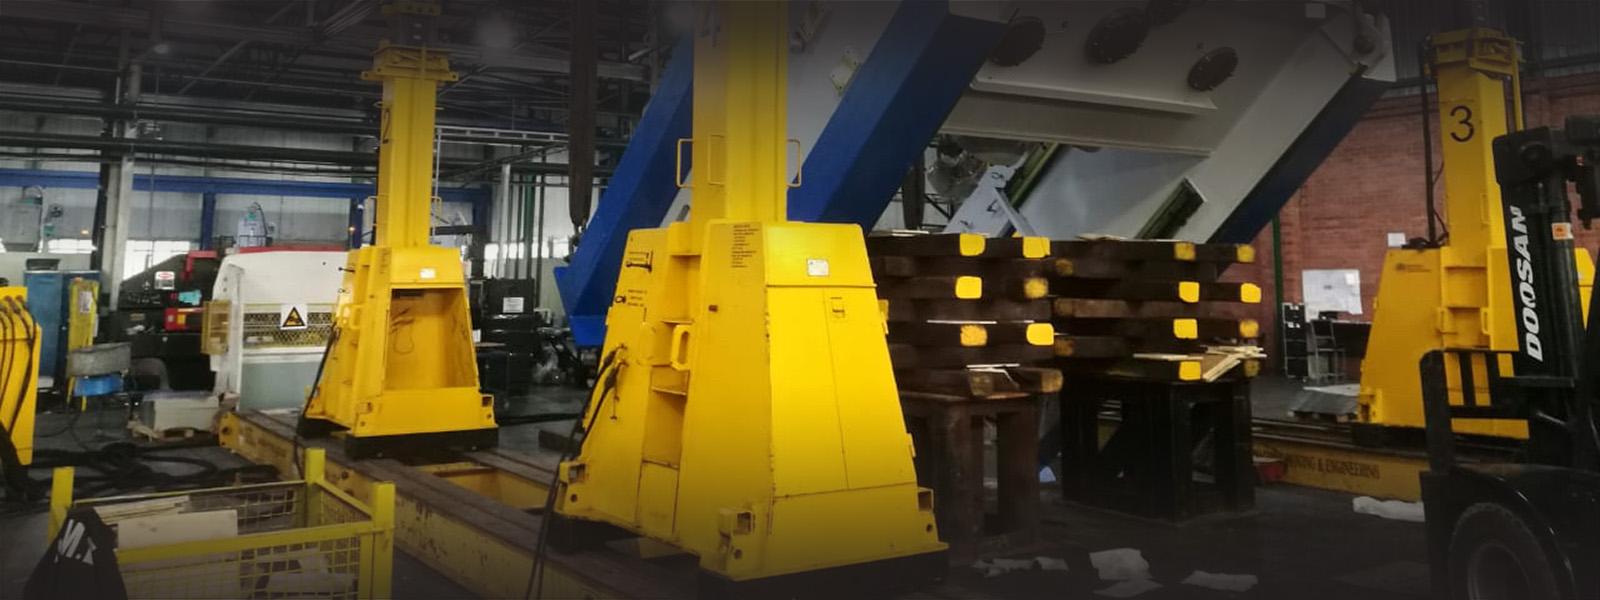 heavy-lifting-division-projects-MME-machine-moving-engineering-Gauteng-KwaZulu-Natal-ZA